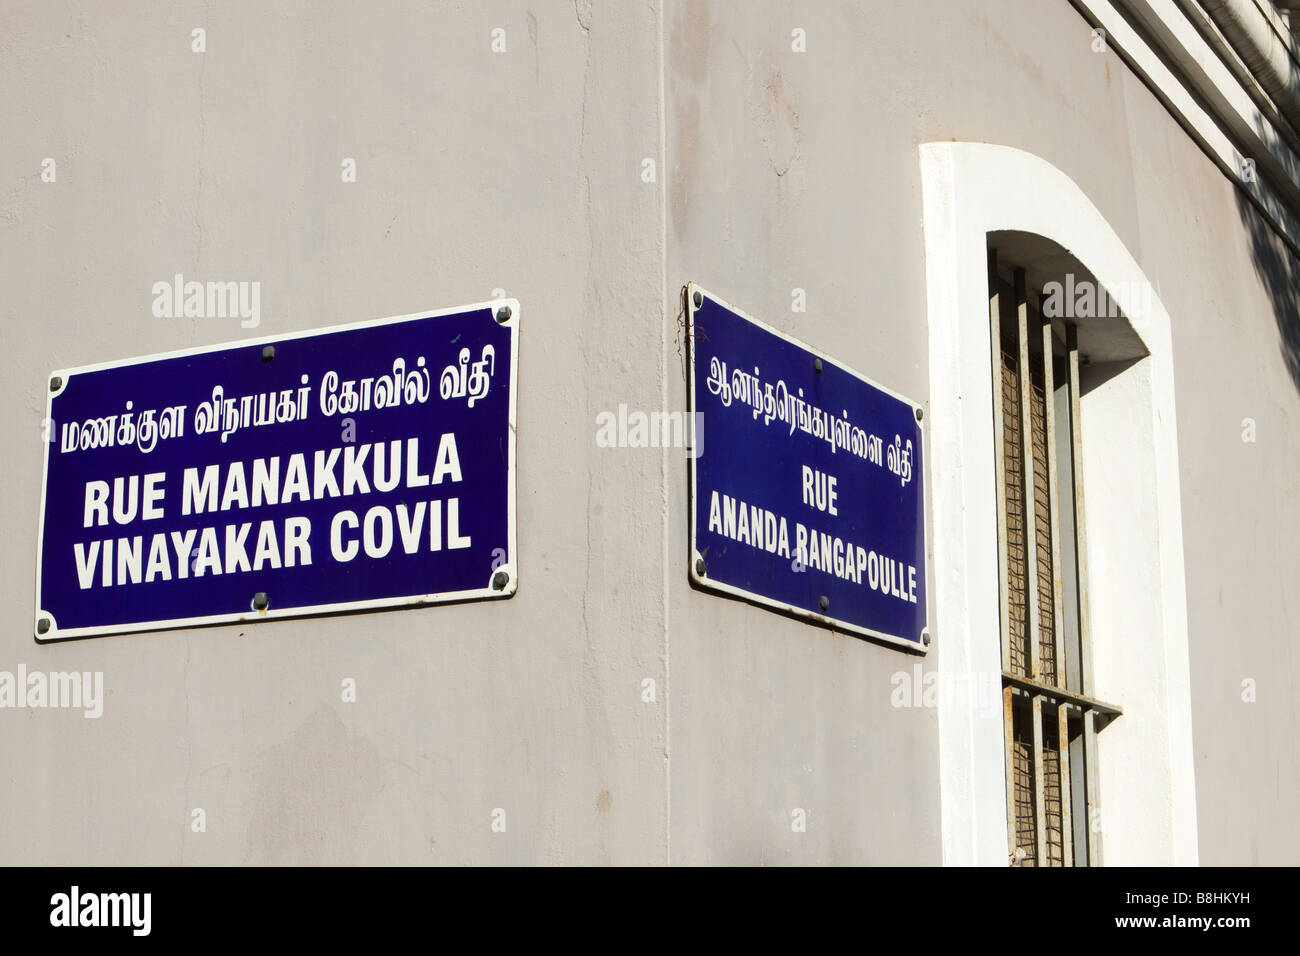 India Pondicherry Rue Mankkula Vinyayagar Koli Street French and Tamil bilingual road name signs - Stock Image